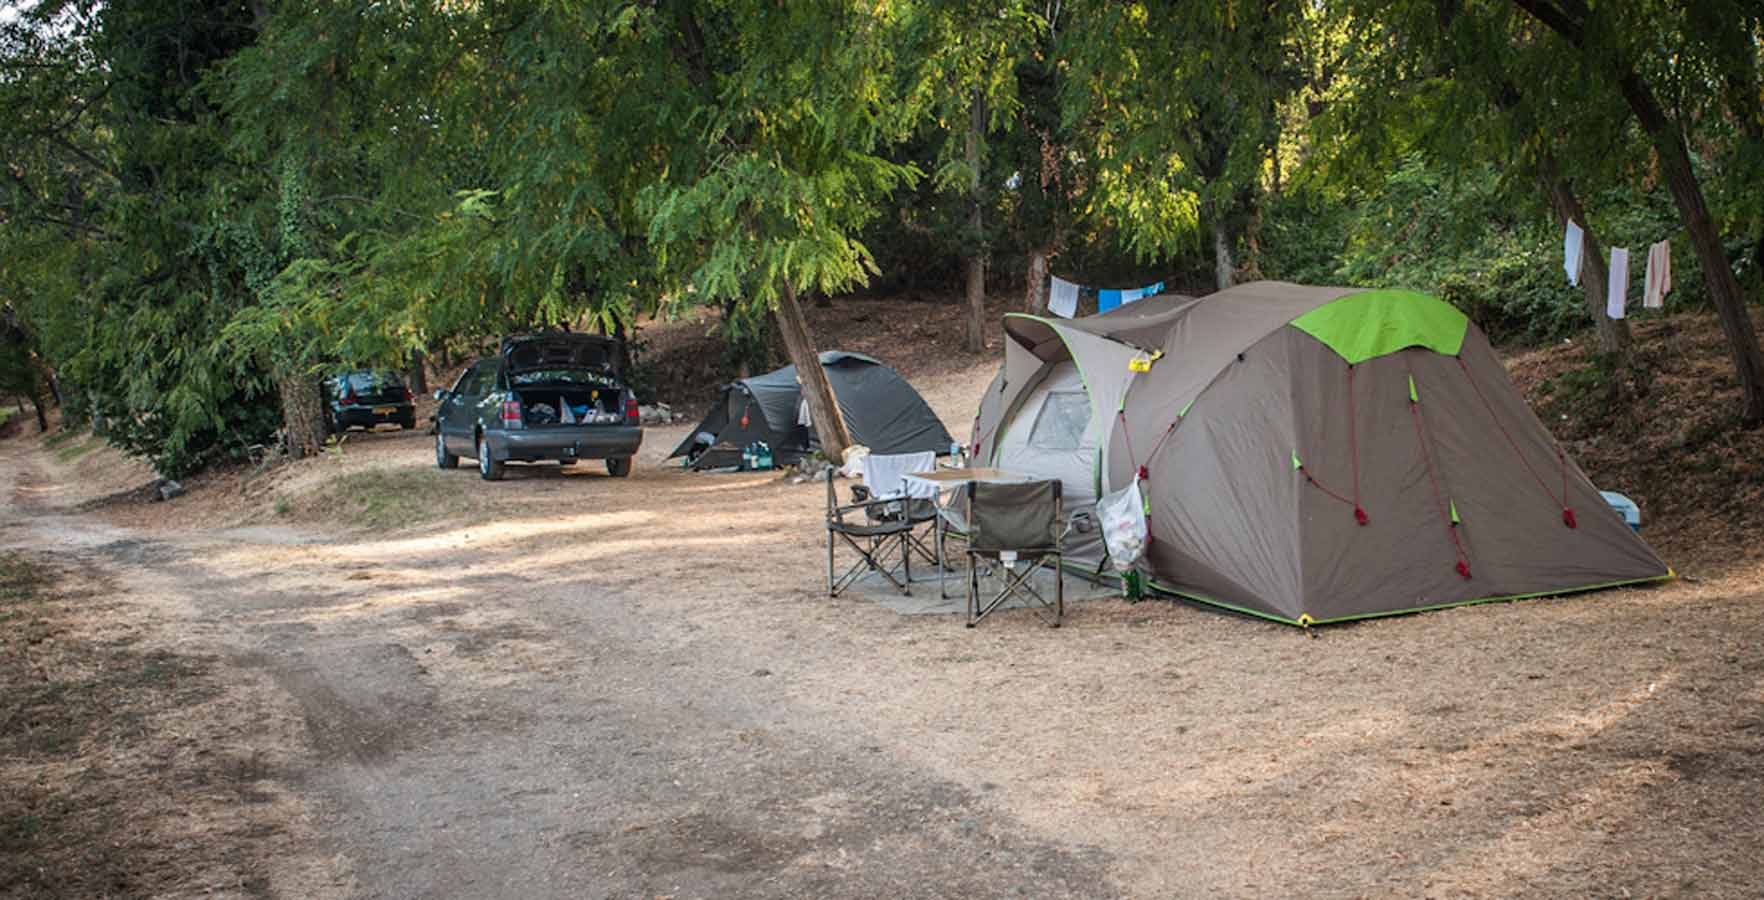 Camping Opatija - Croatian Camping Union